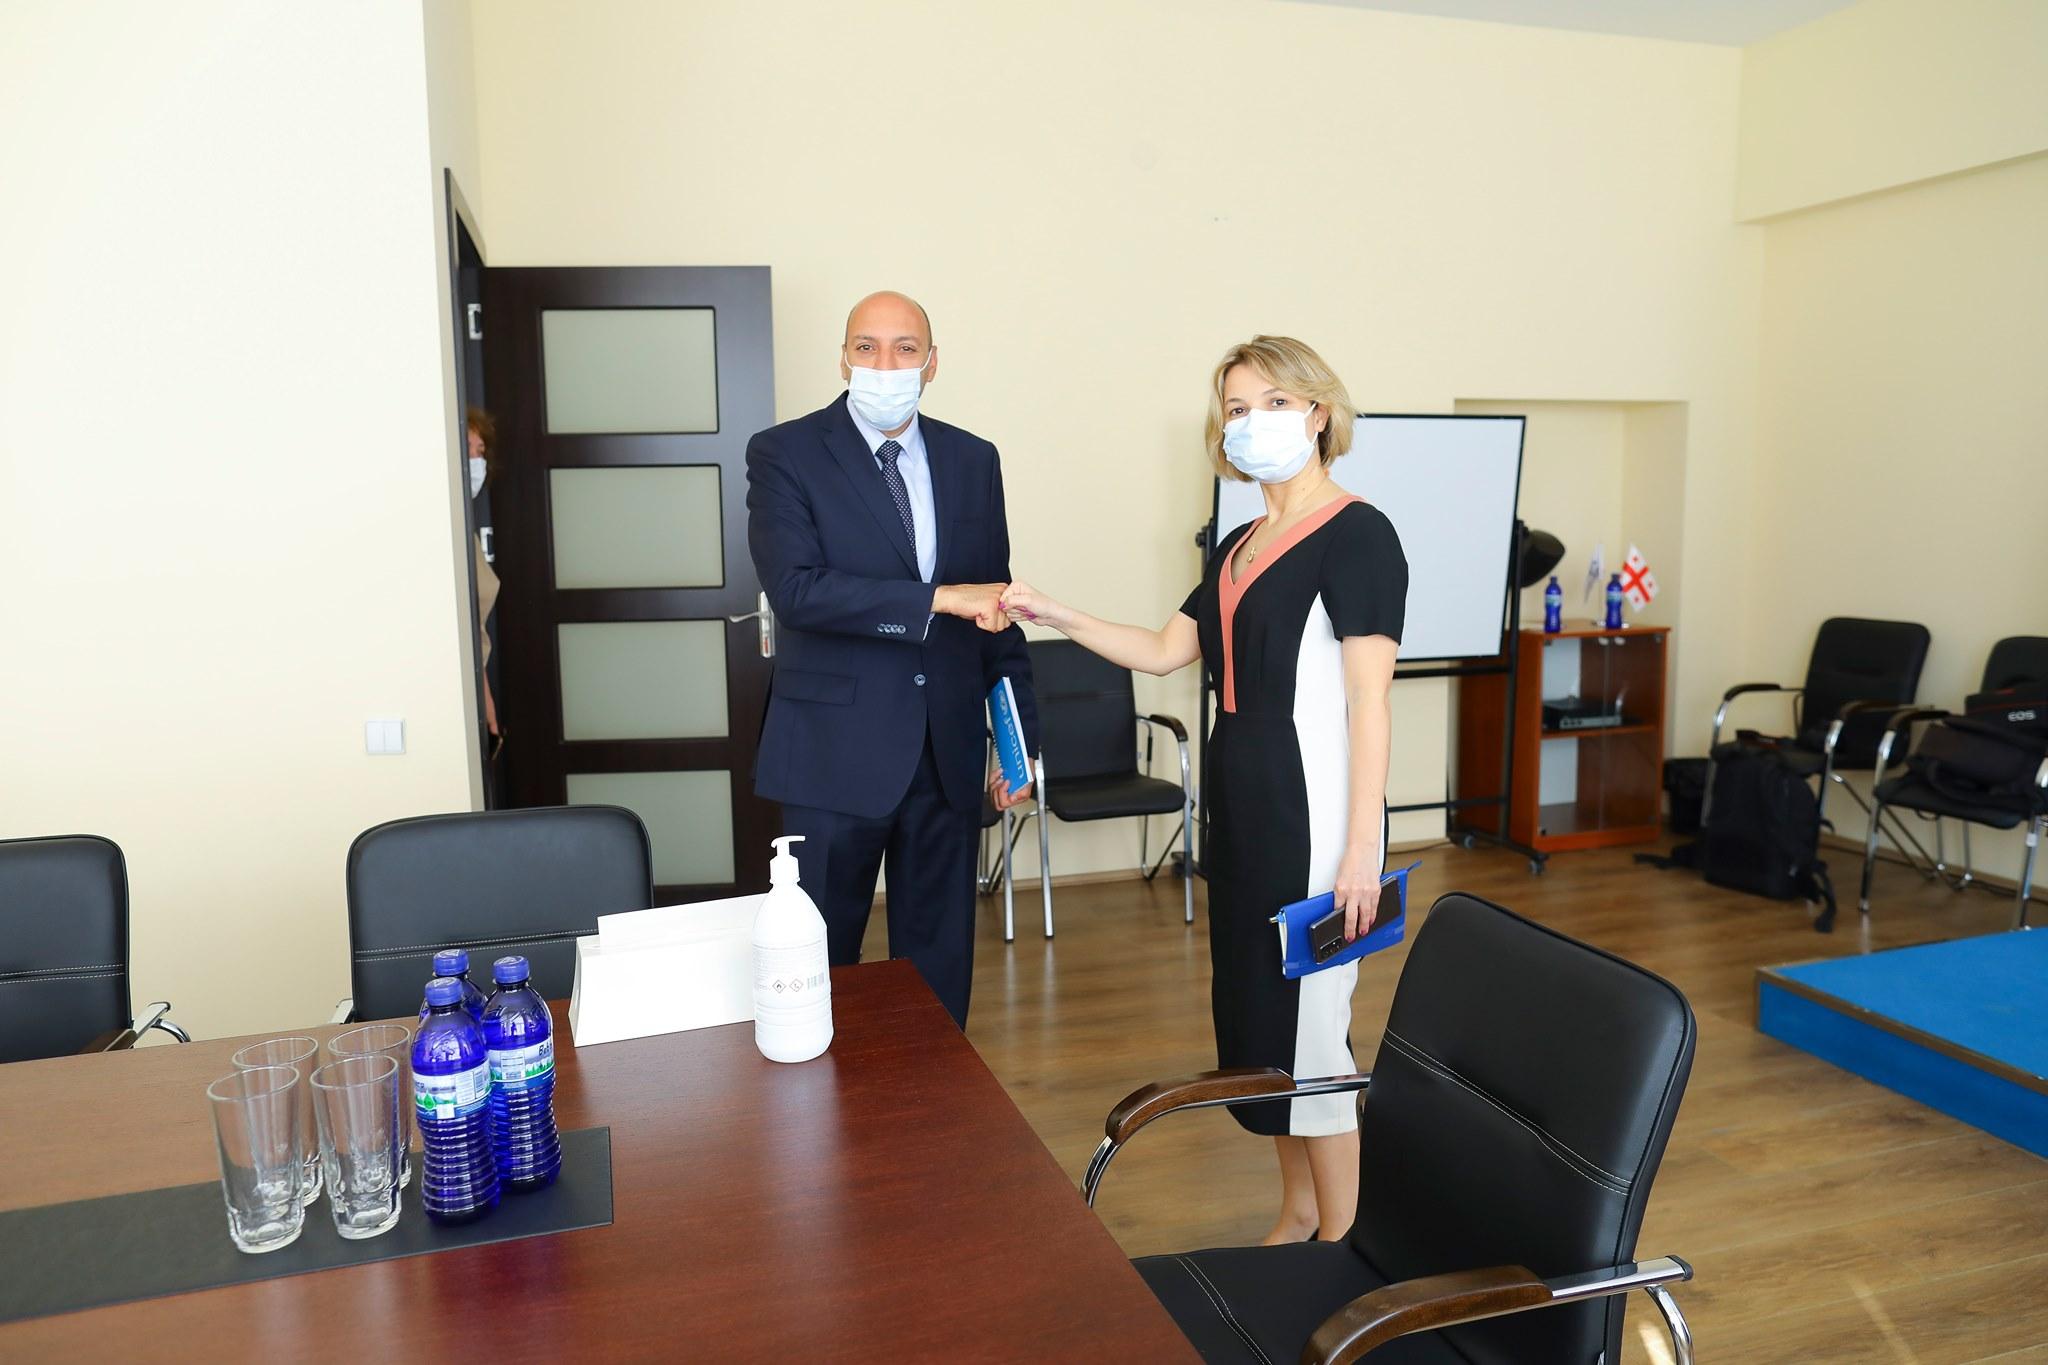 UNICEF Representative in Georgia, Ghassan Khalil met with the Public Defender of Georgia, Nino Lomjaria